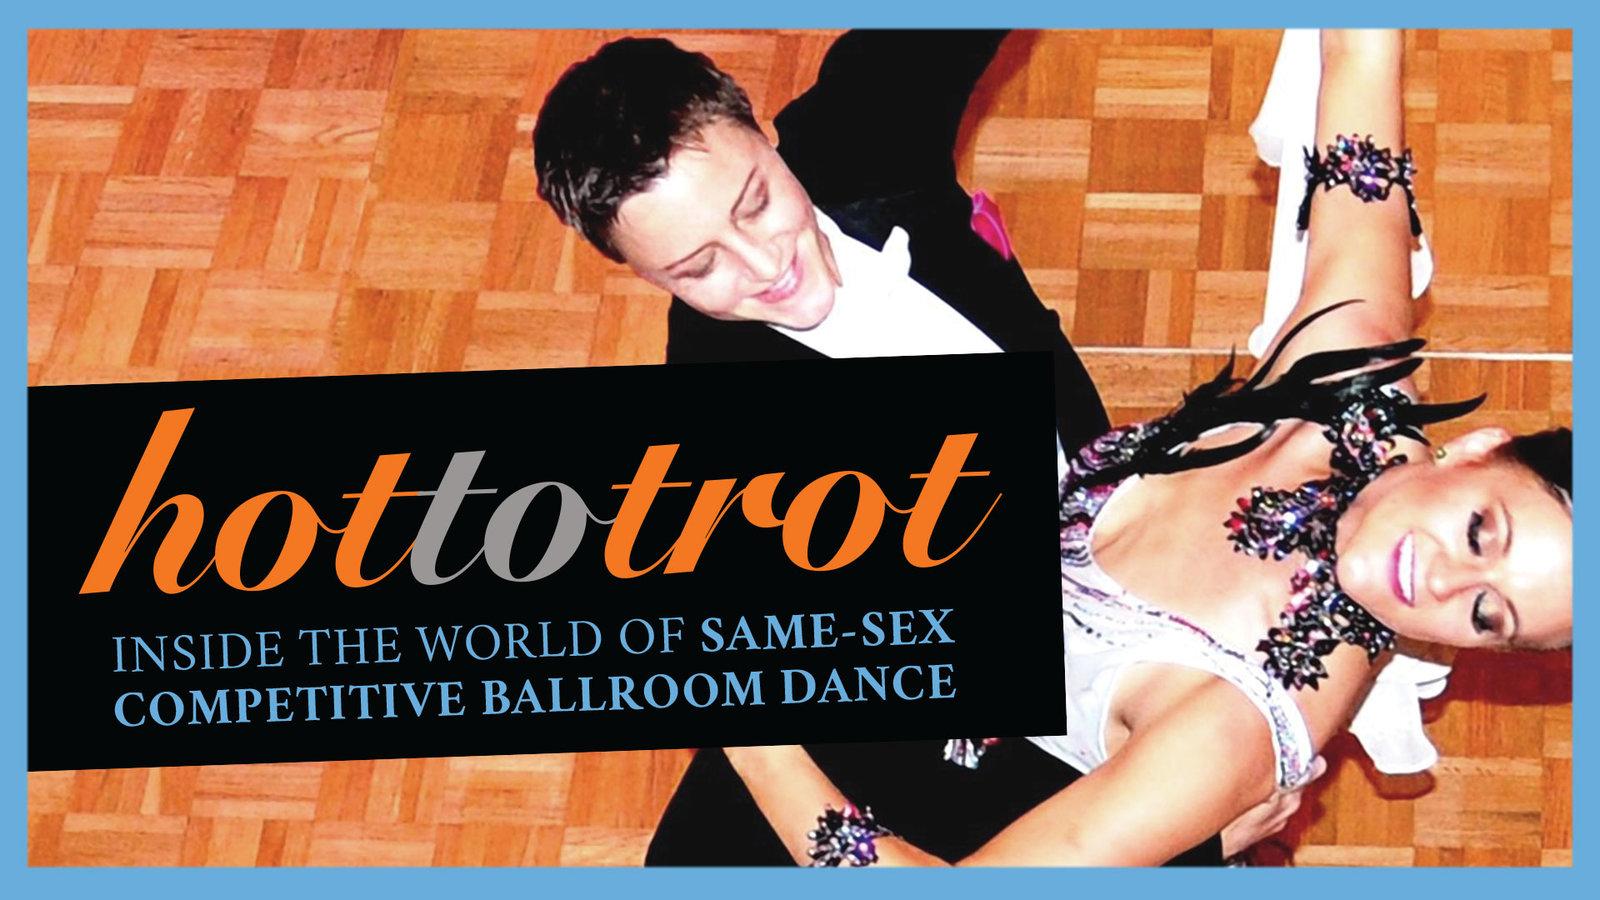 Hot to Trot - The World of Same-Sex Ballroom Dance